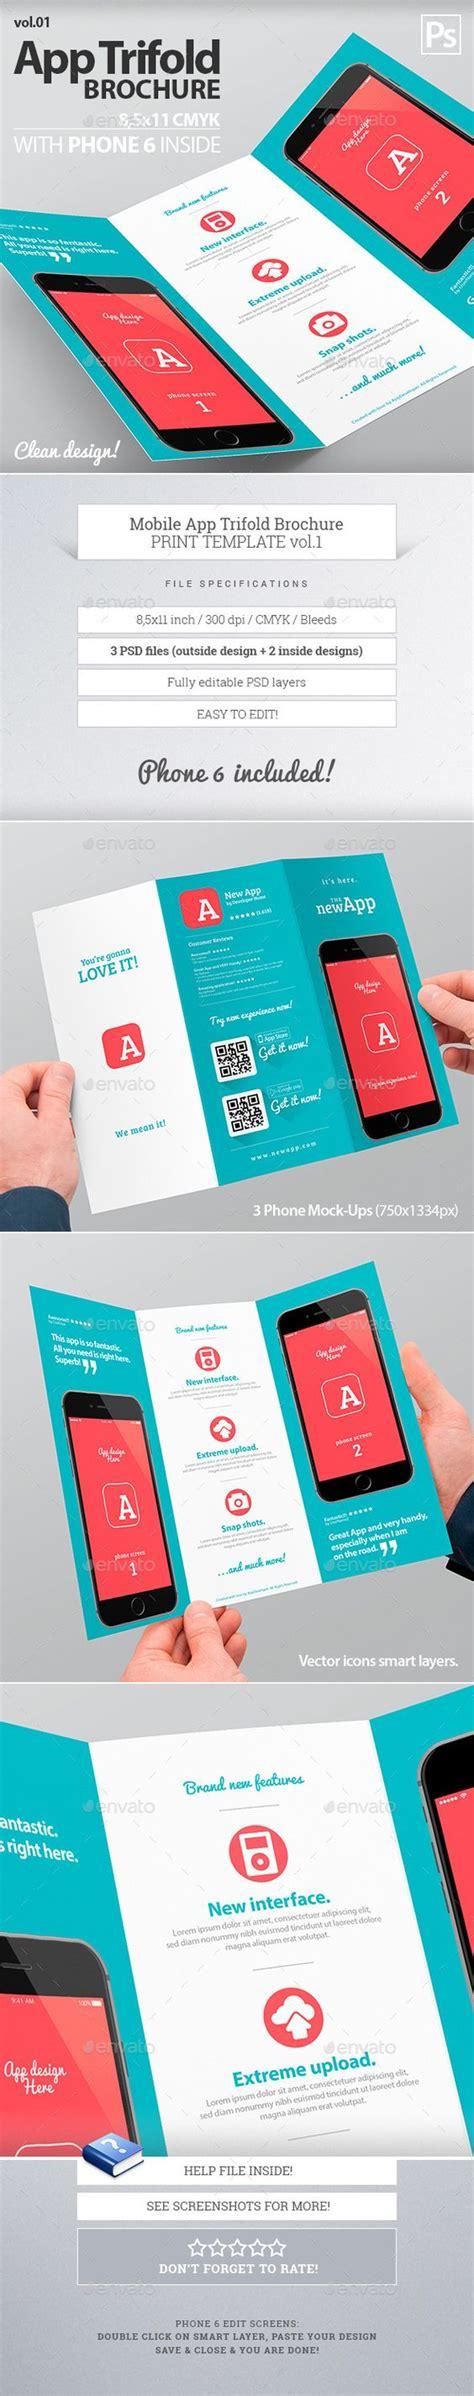 design leaflet app christmas cards mobile app design and mobiles